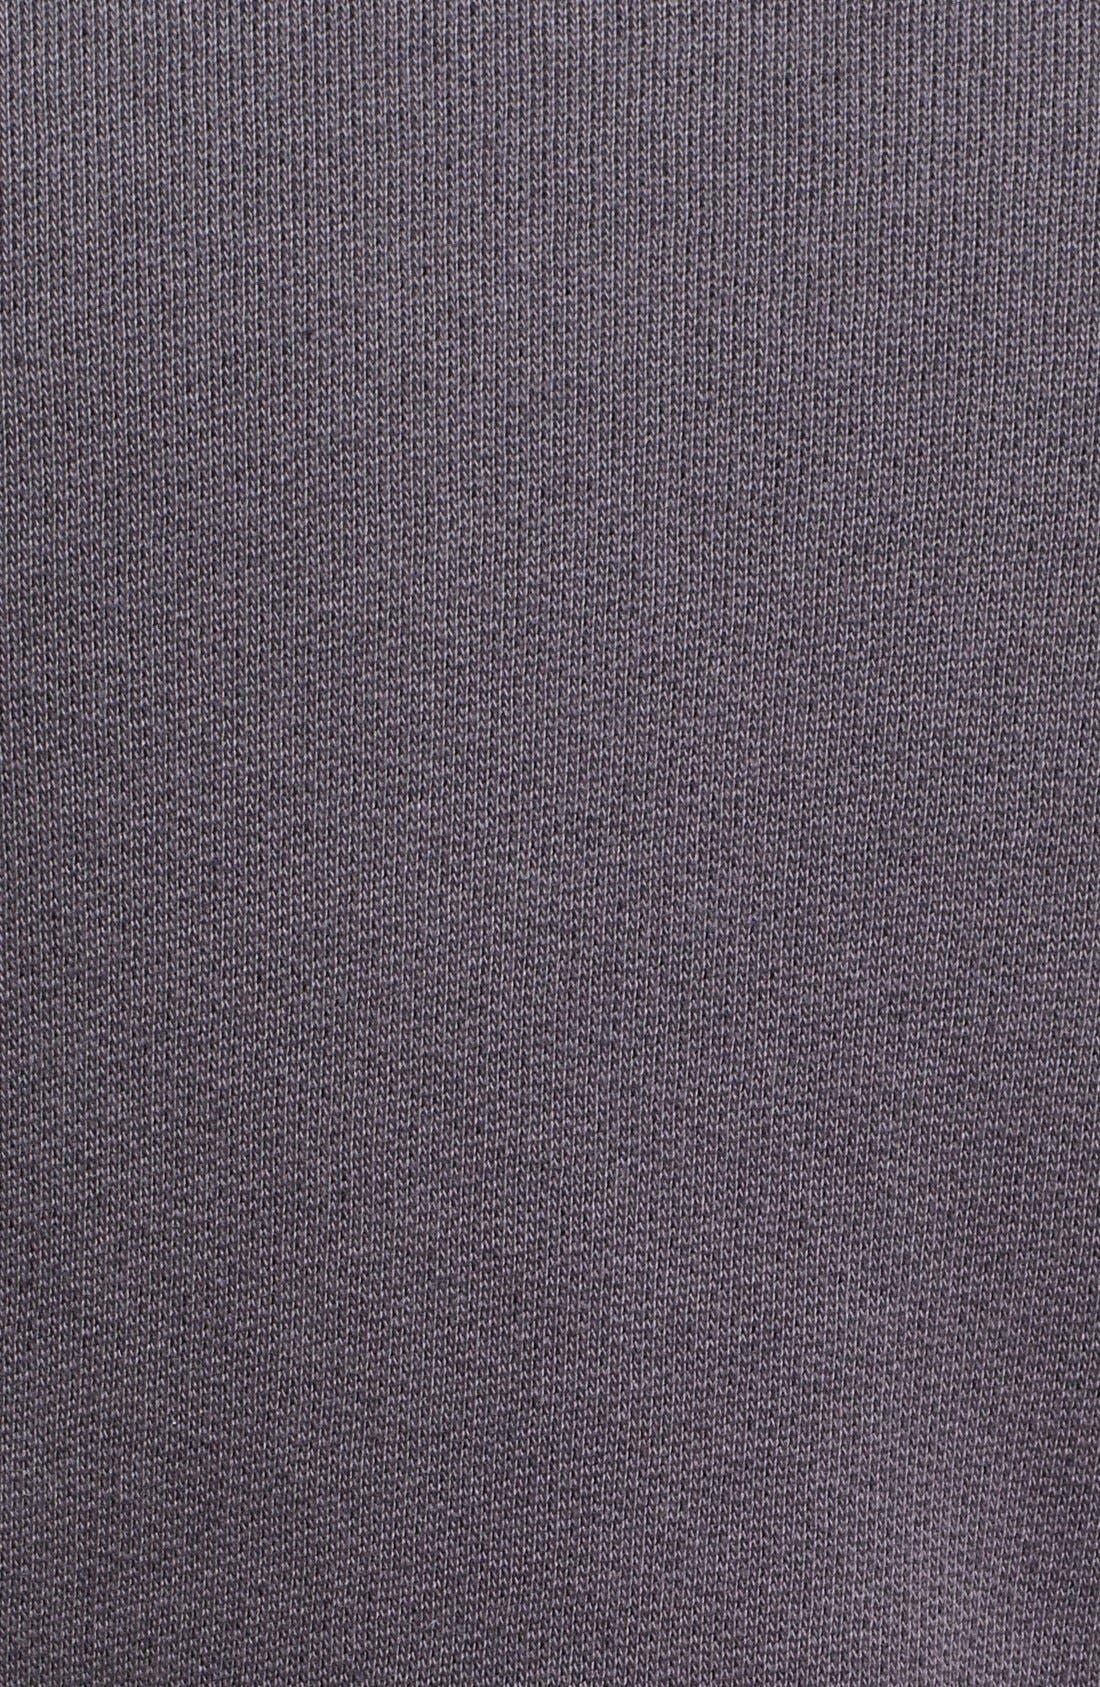 'Ellsworth' Shawl Collar Pullover,                             Alternate thumbnail 2, color,                             020